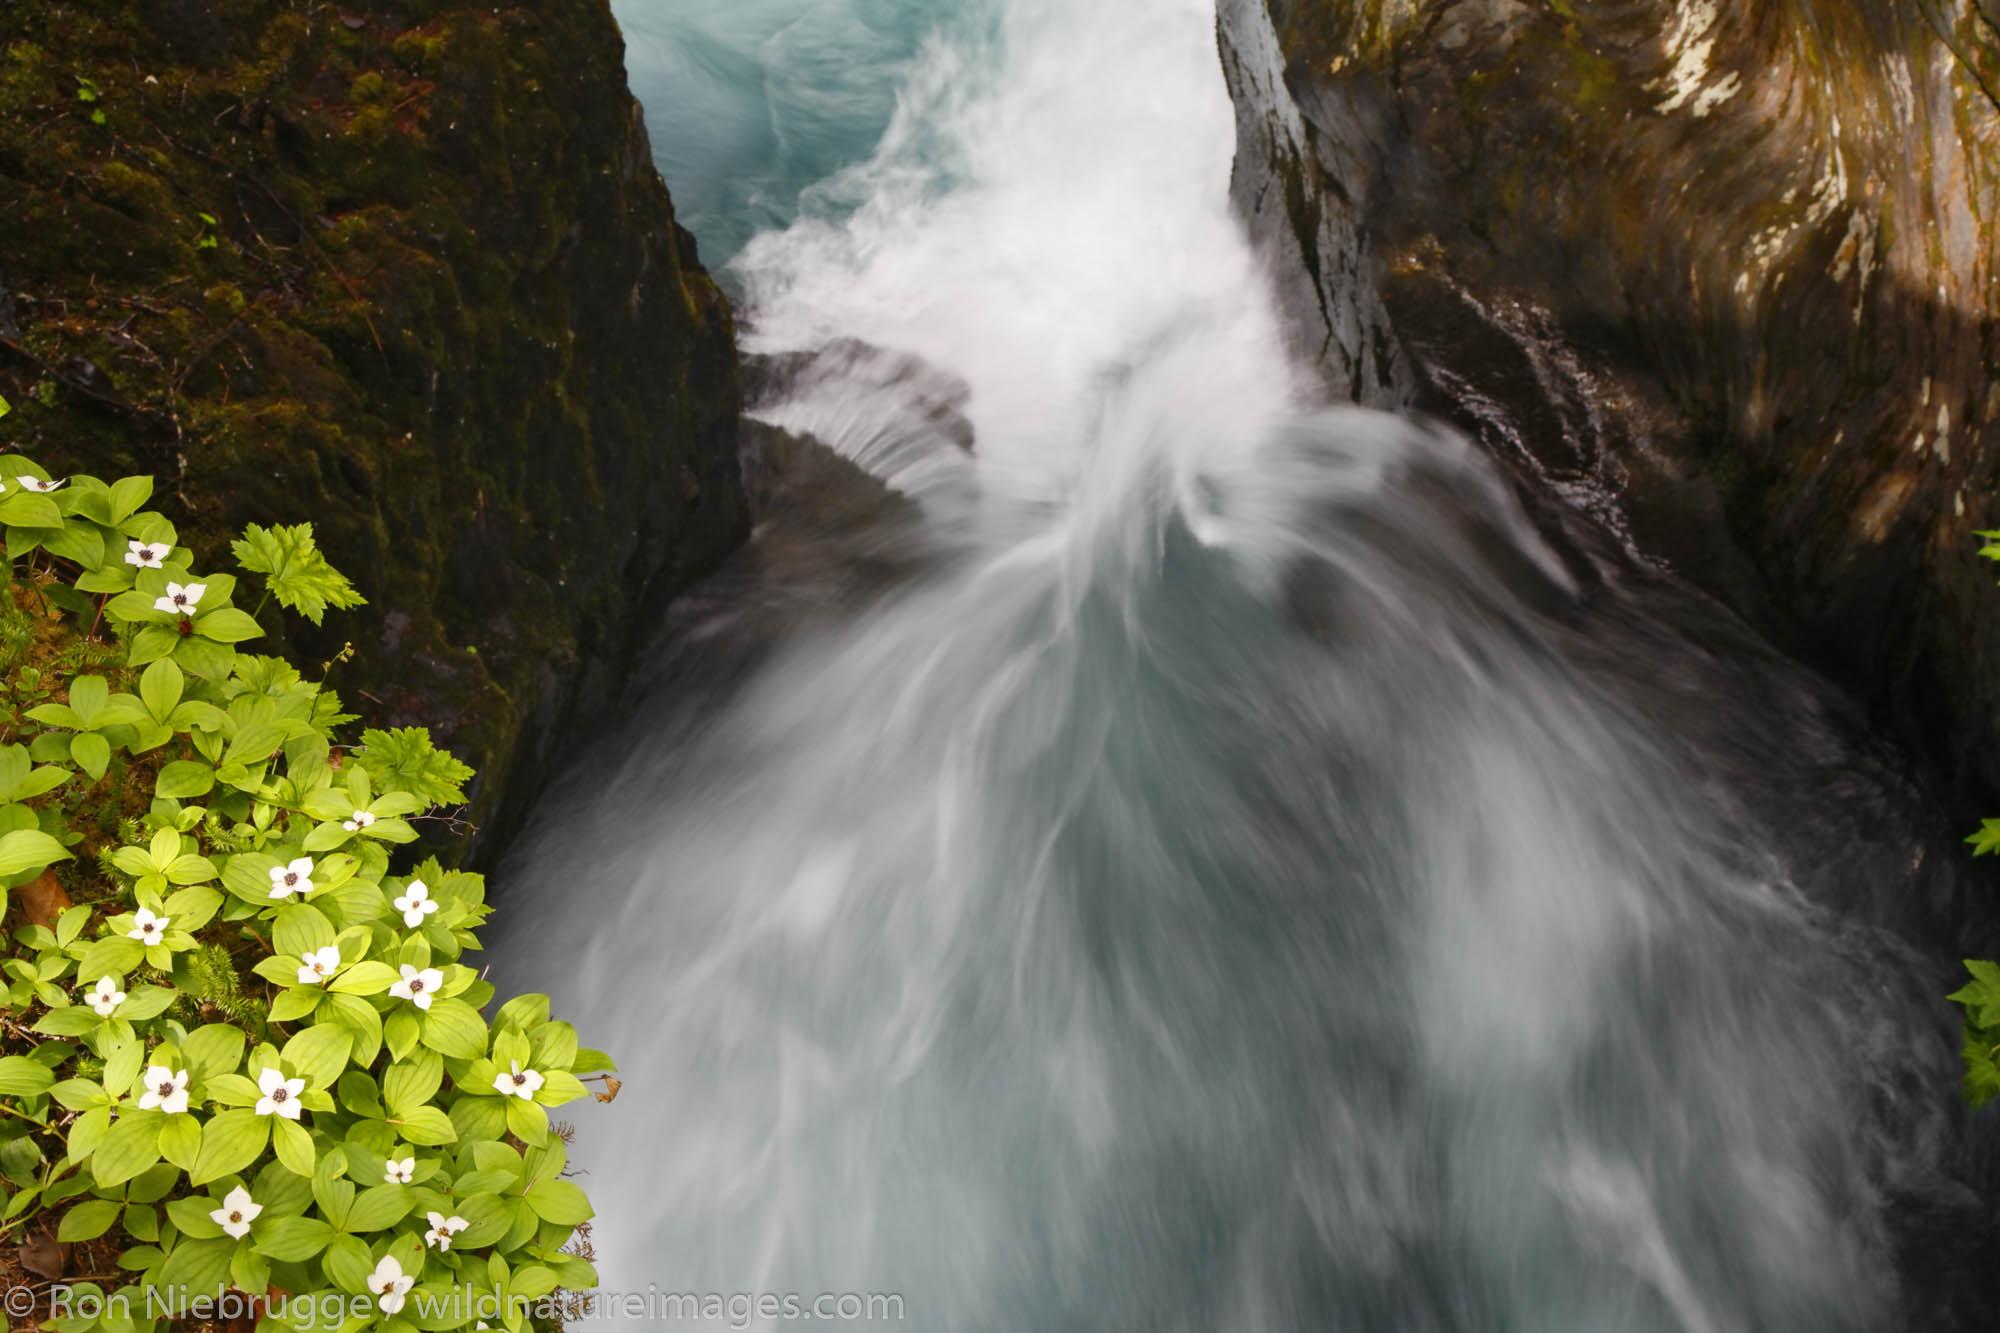 Winner Creek Gorge, from the Winner Creek Gorge Trail, Girdwood, Chugach National Forest, Alaska.